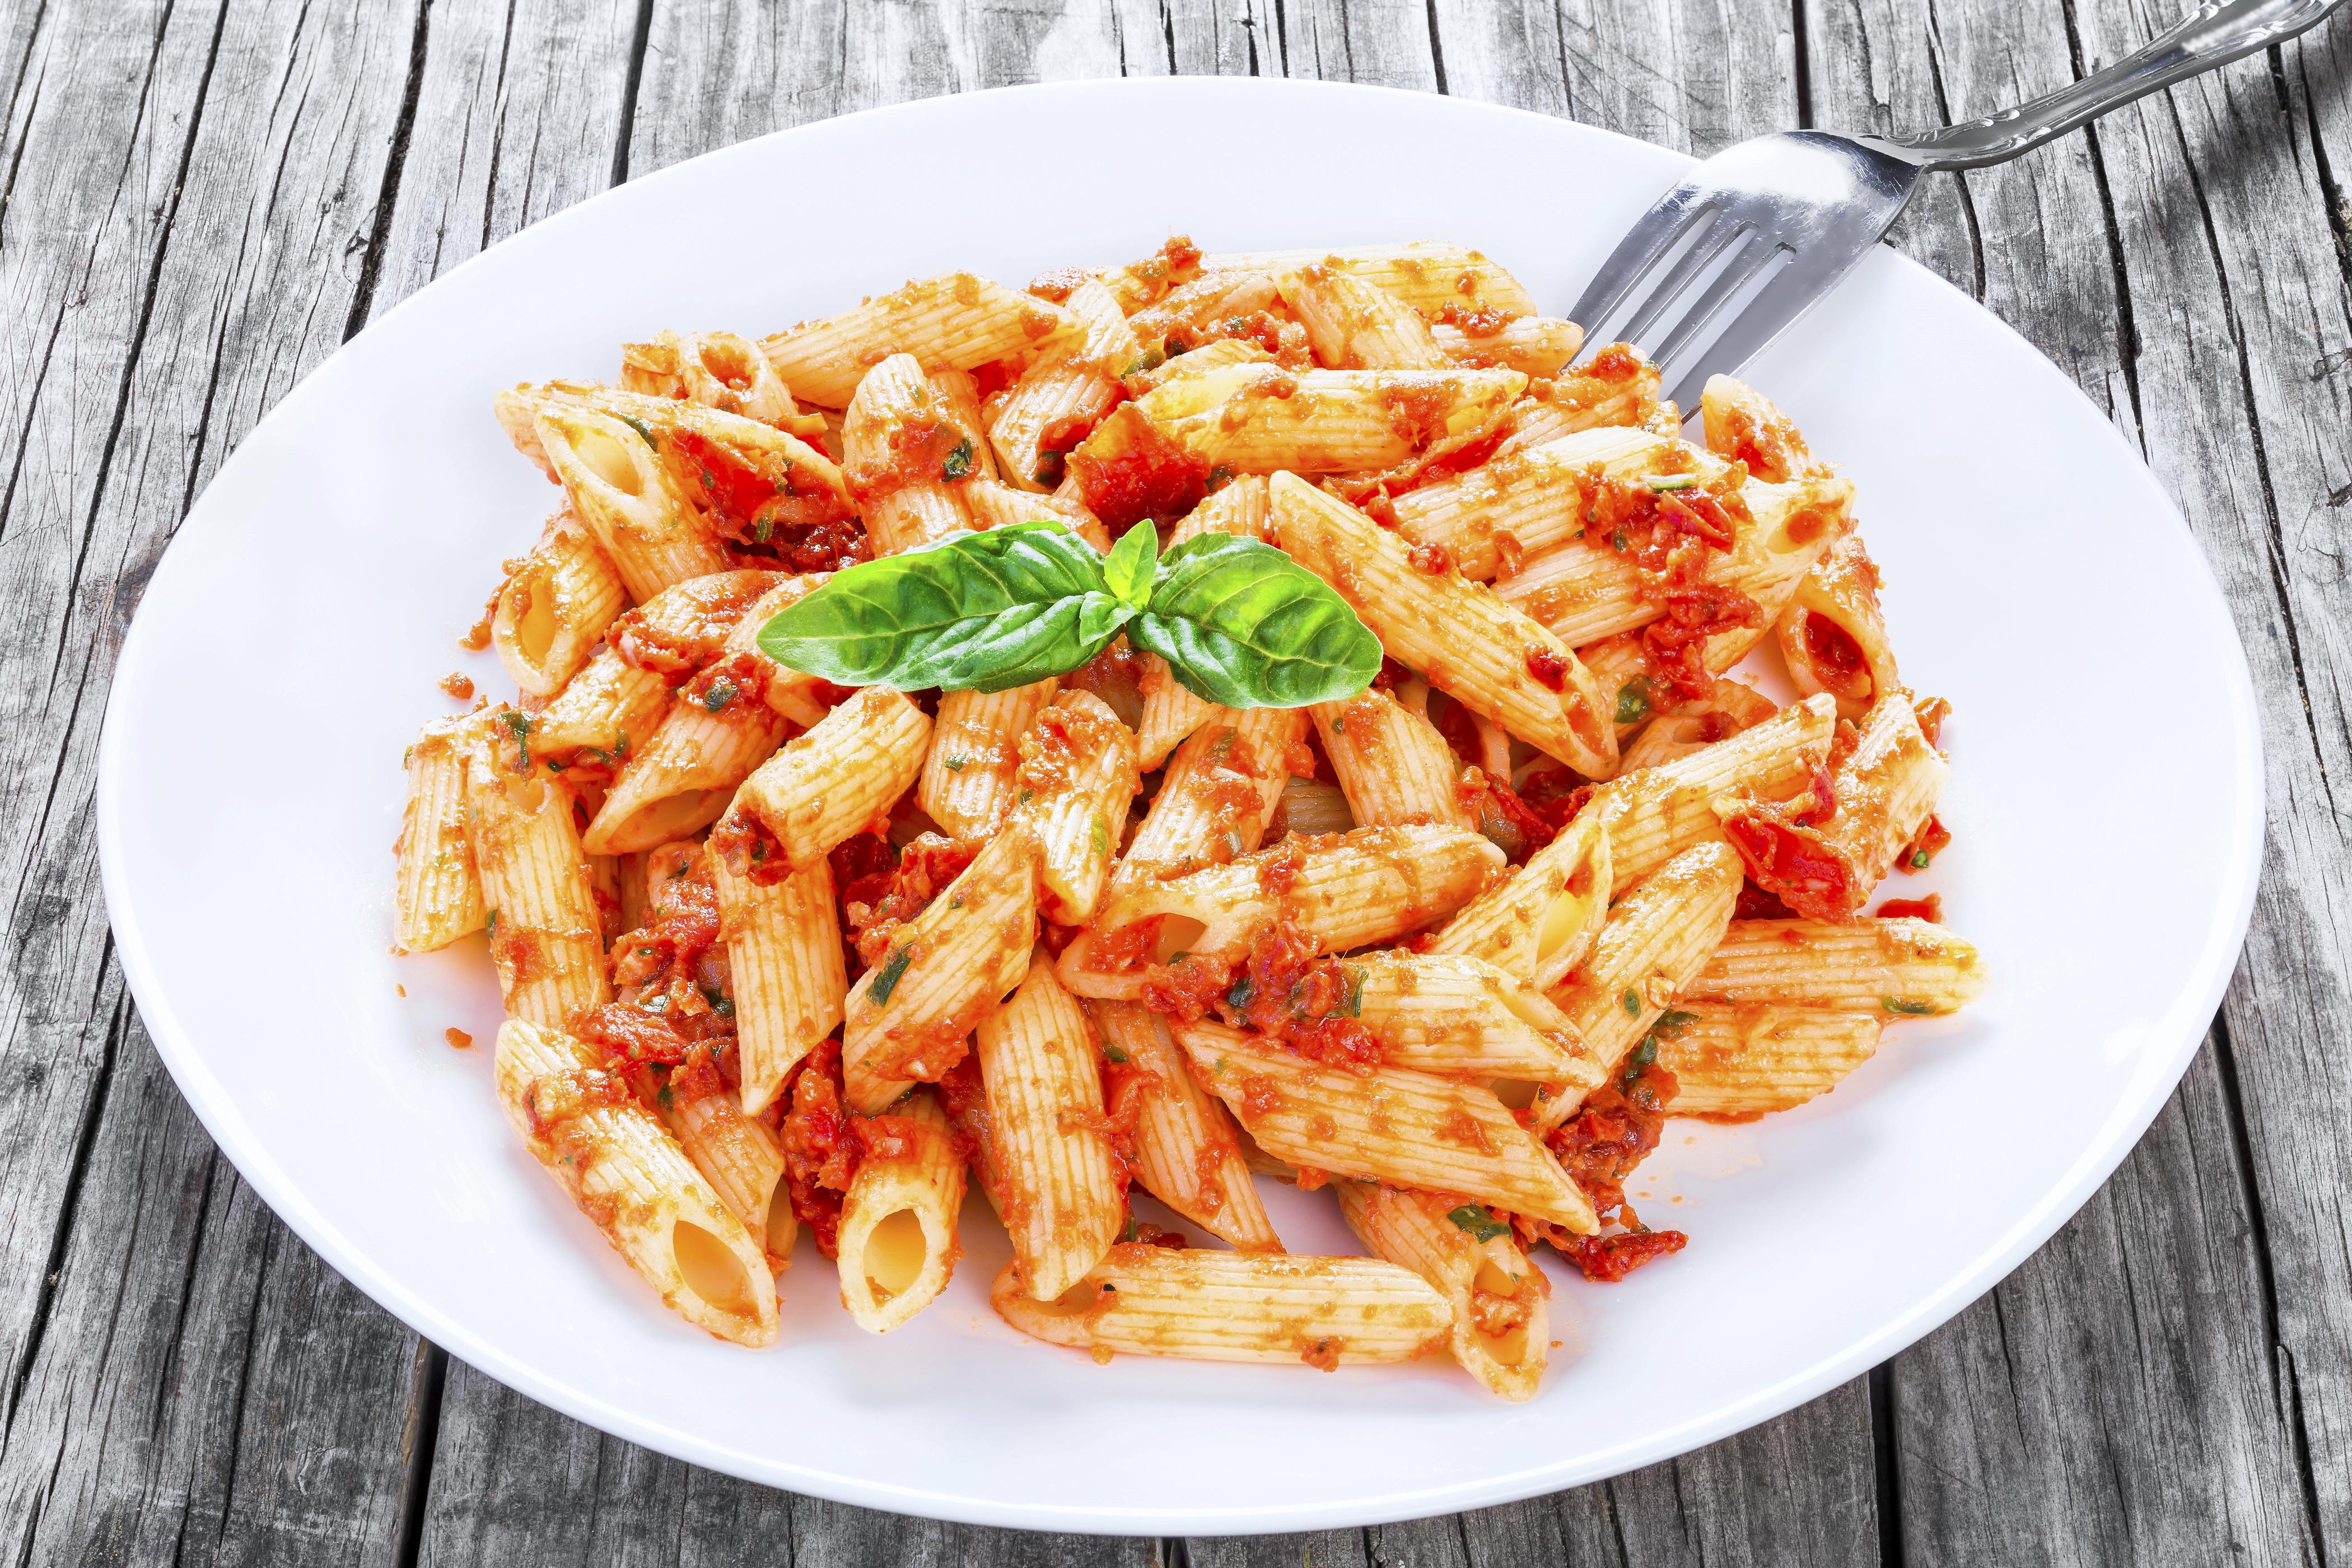 Italian Pasta Penne with Sun-Dried Tomato Pesto, close-up